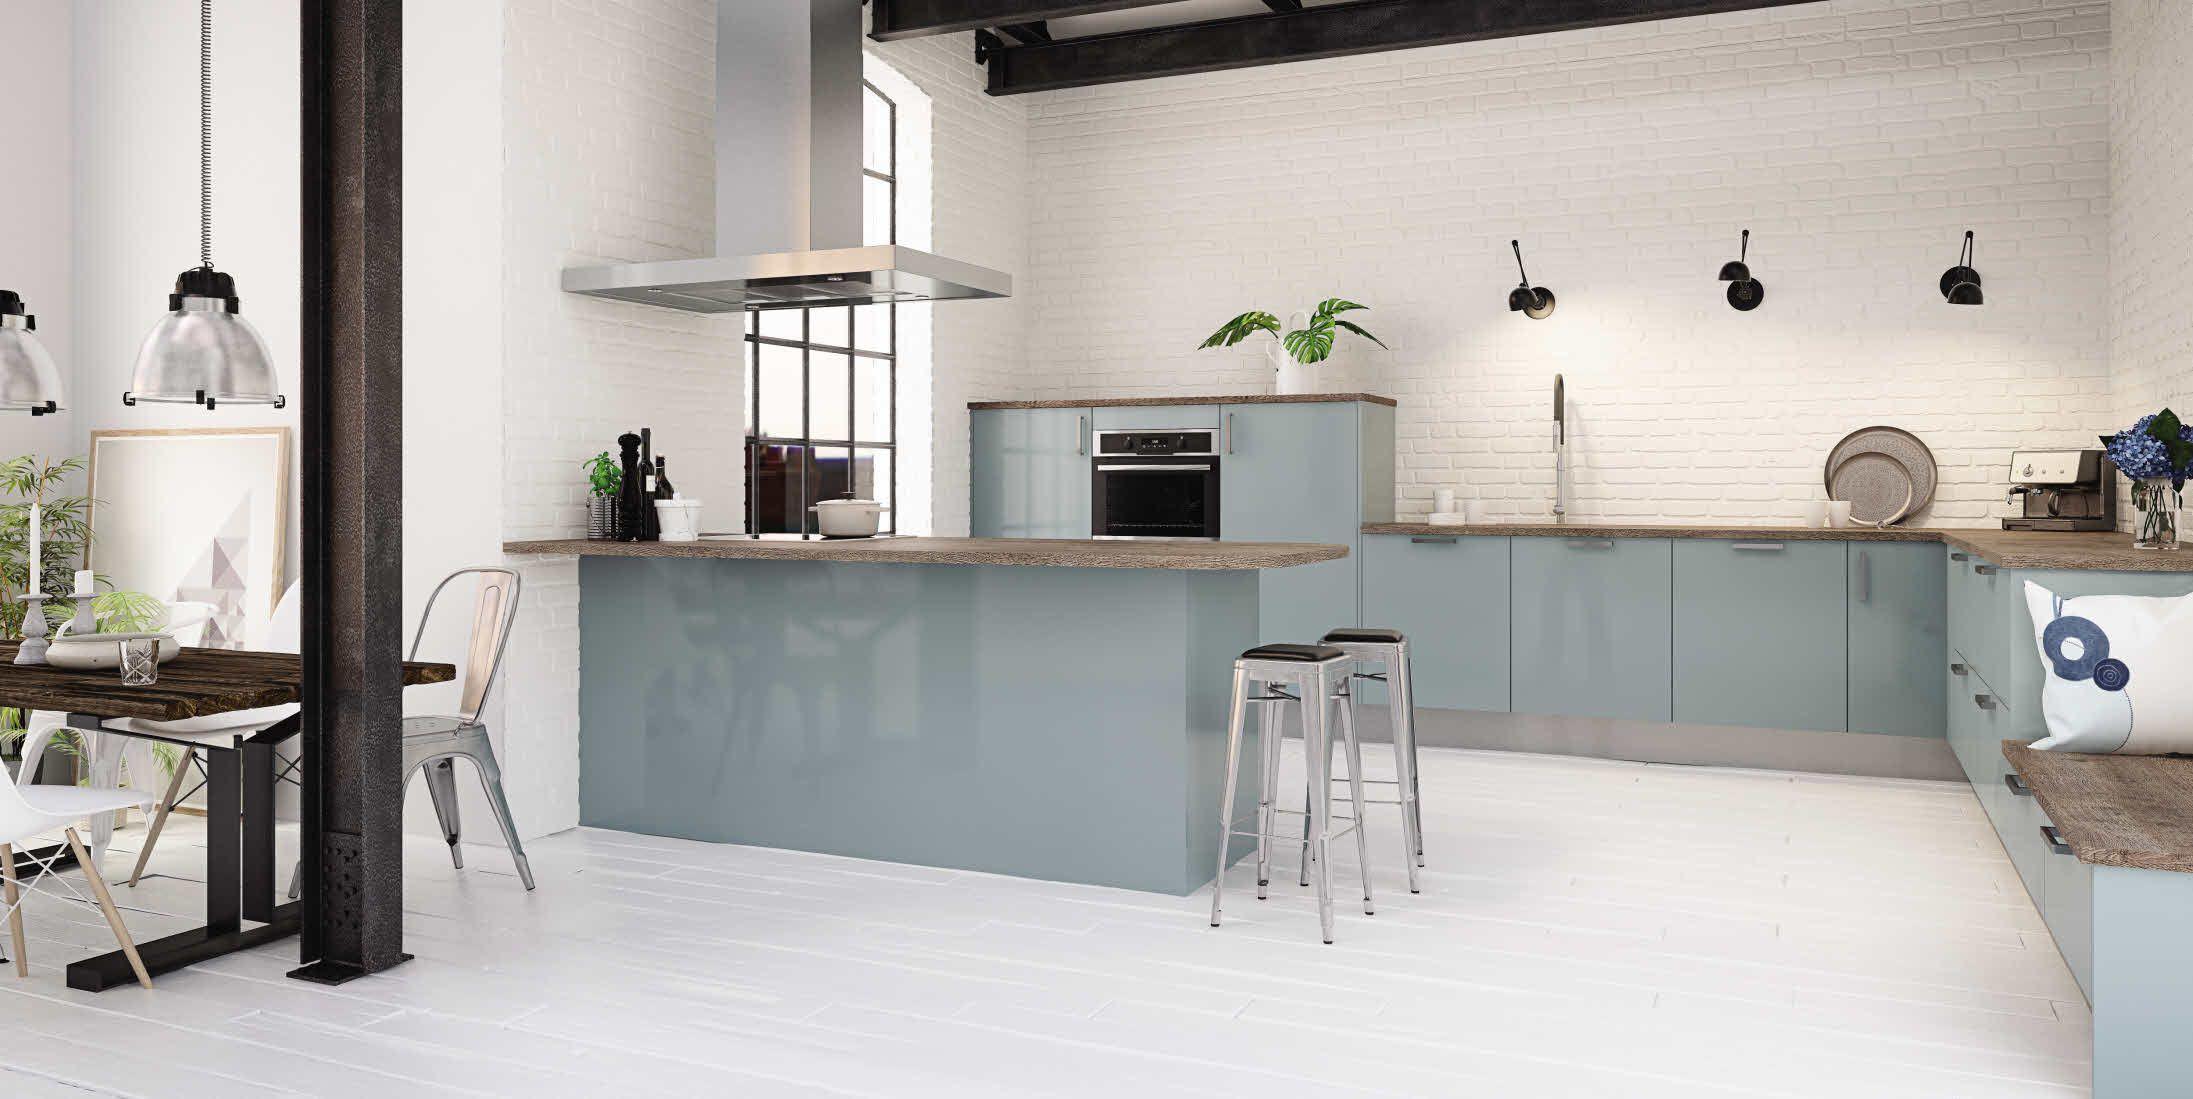 cuisine moderne bleue hygena interieur pinterest cuisine. Black Bedroom Furniture Sets. Home Design Ideas